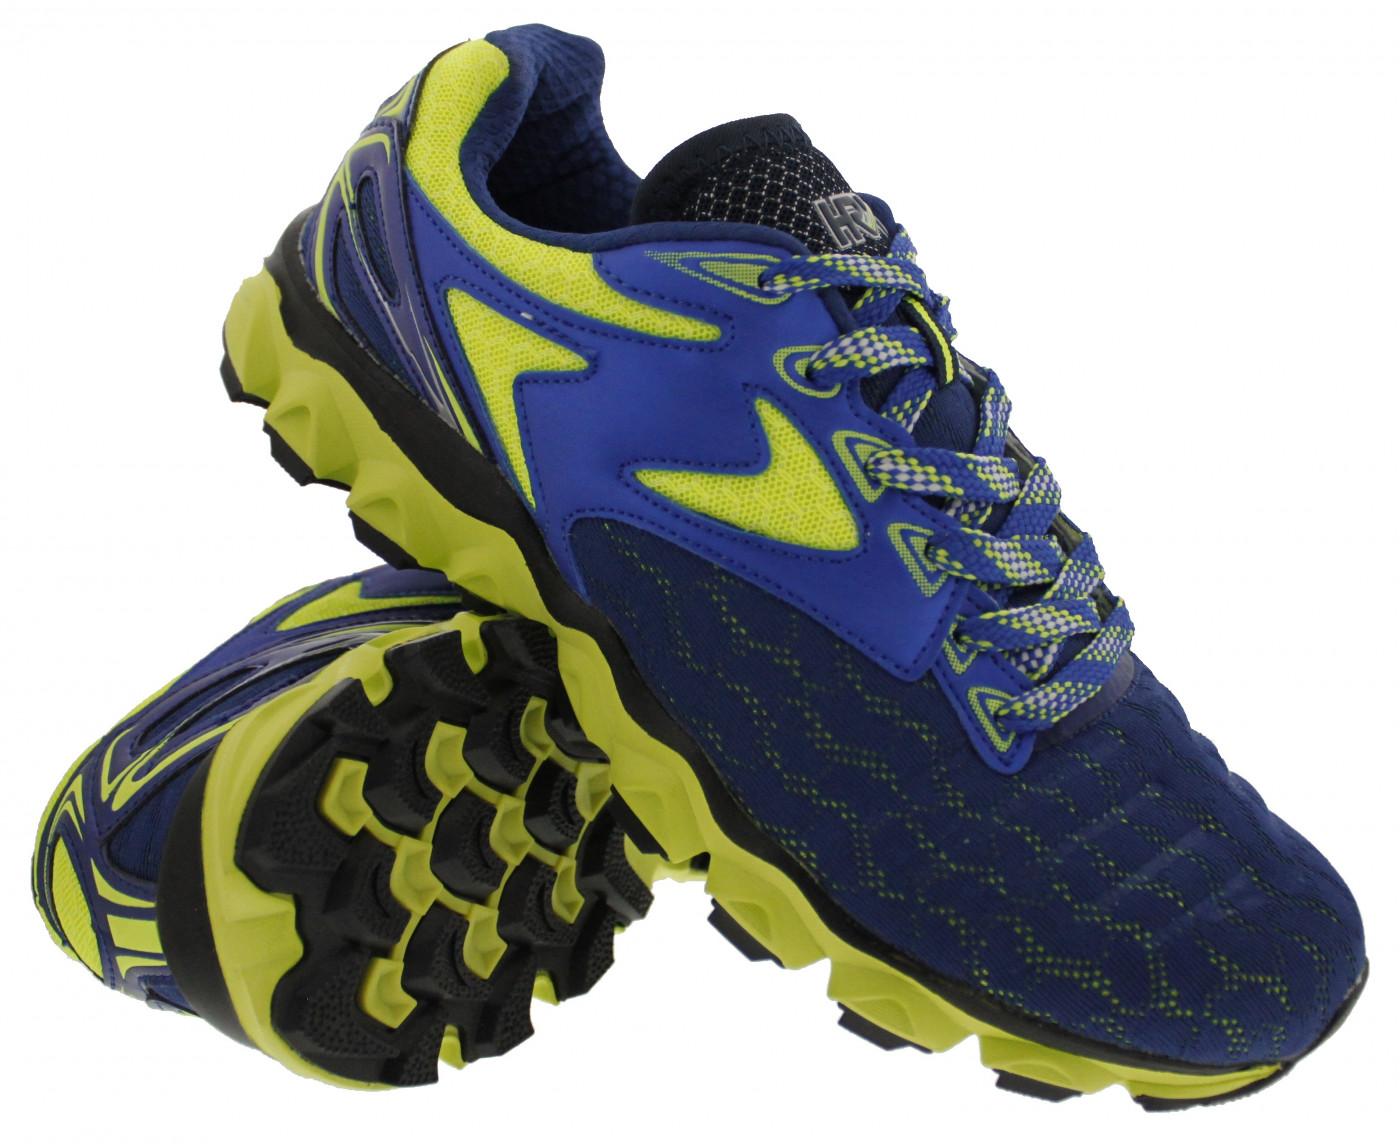 Kondor Man's Shoes MJ-9335A